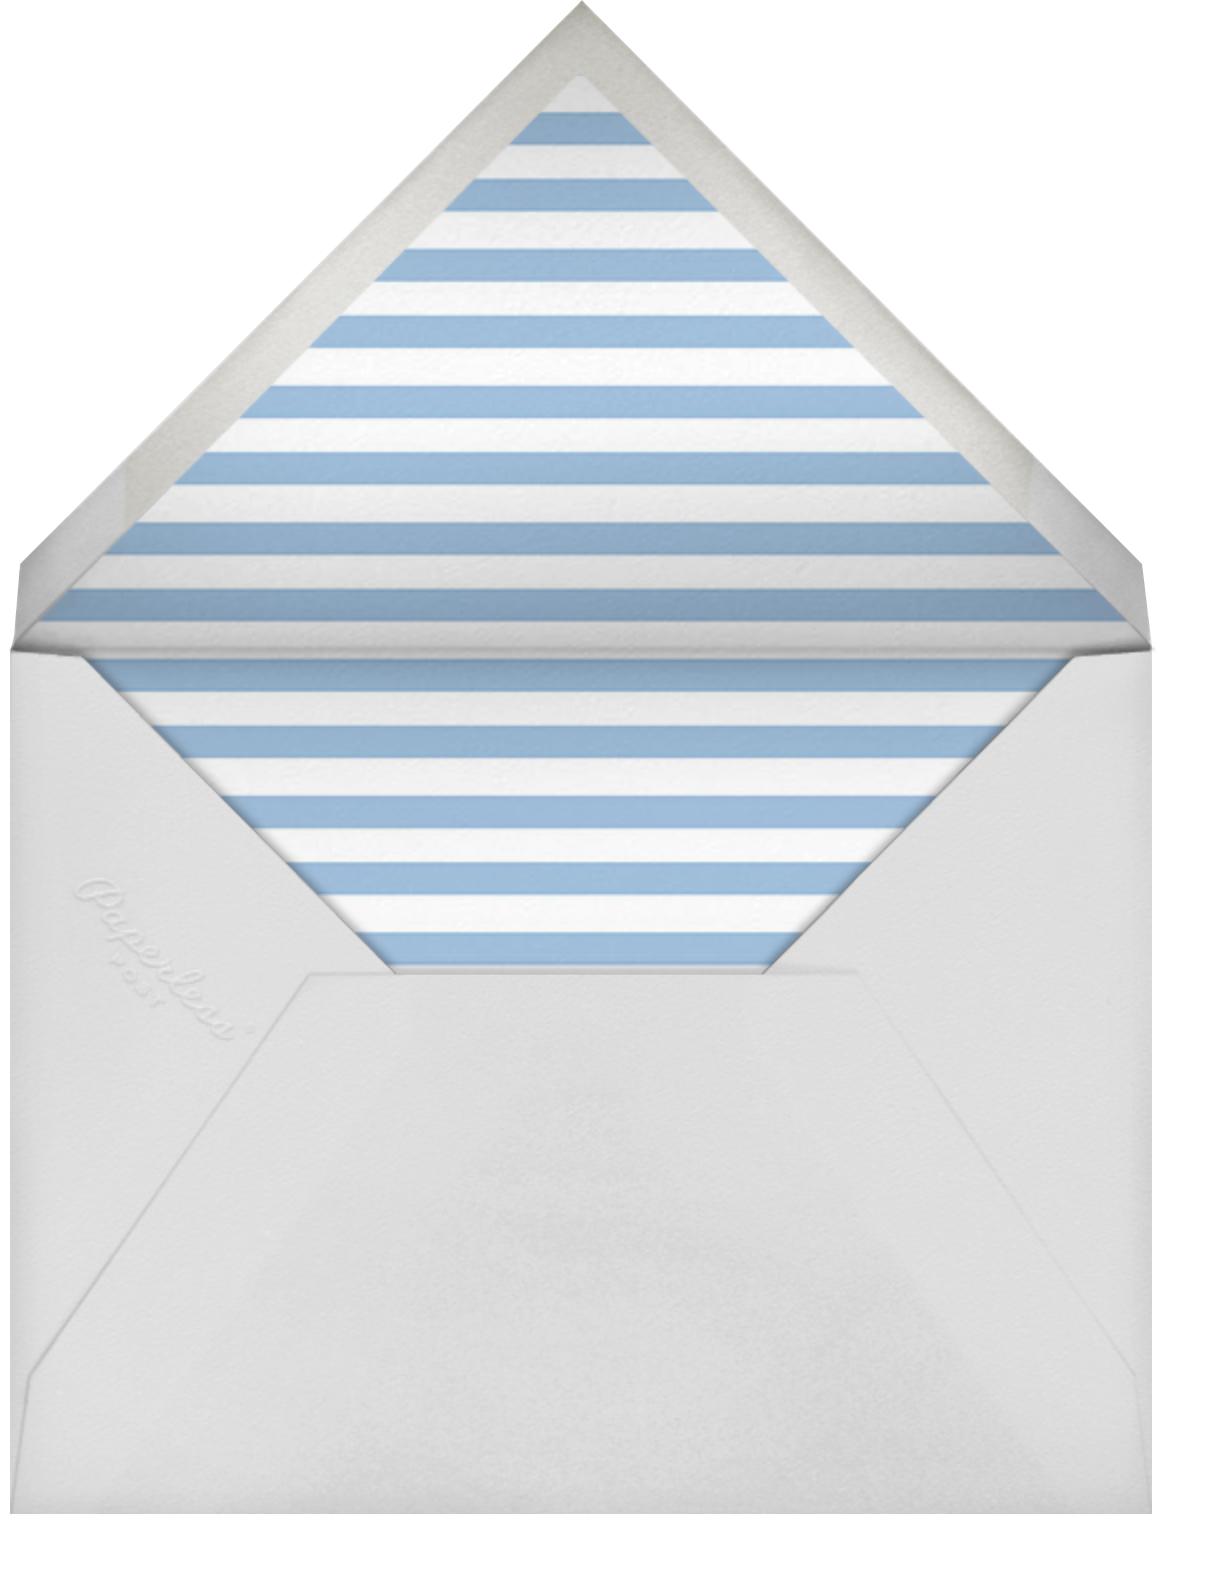 Square Frame (Horizontal) - Blue - Paperless Post - Baptism  - envelope back